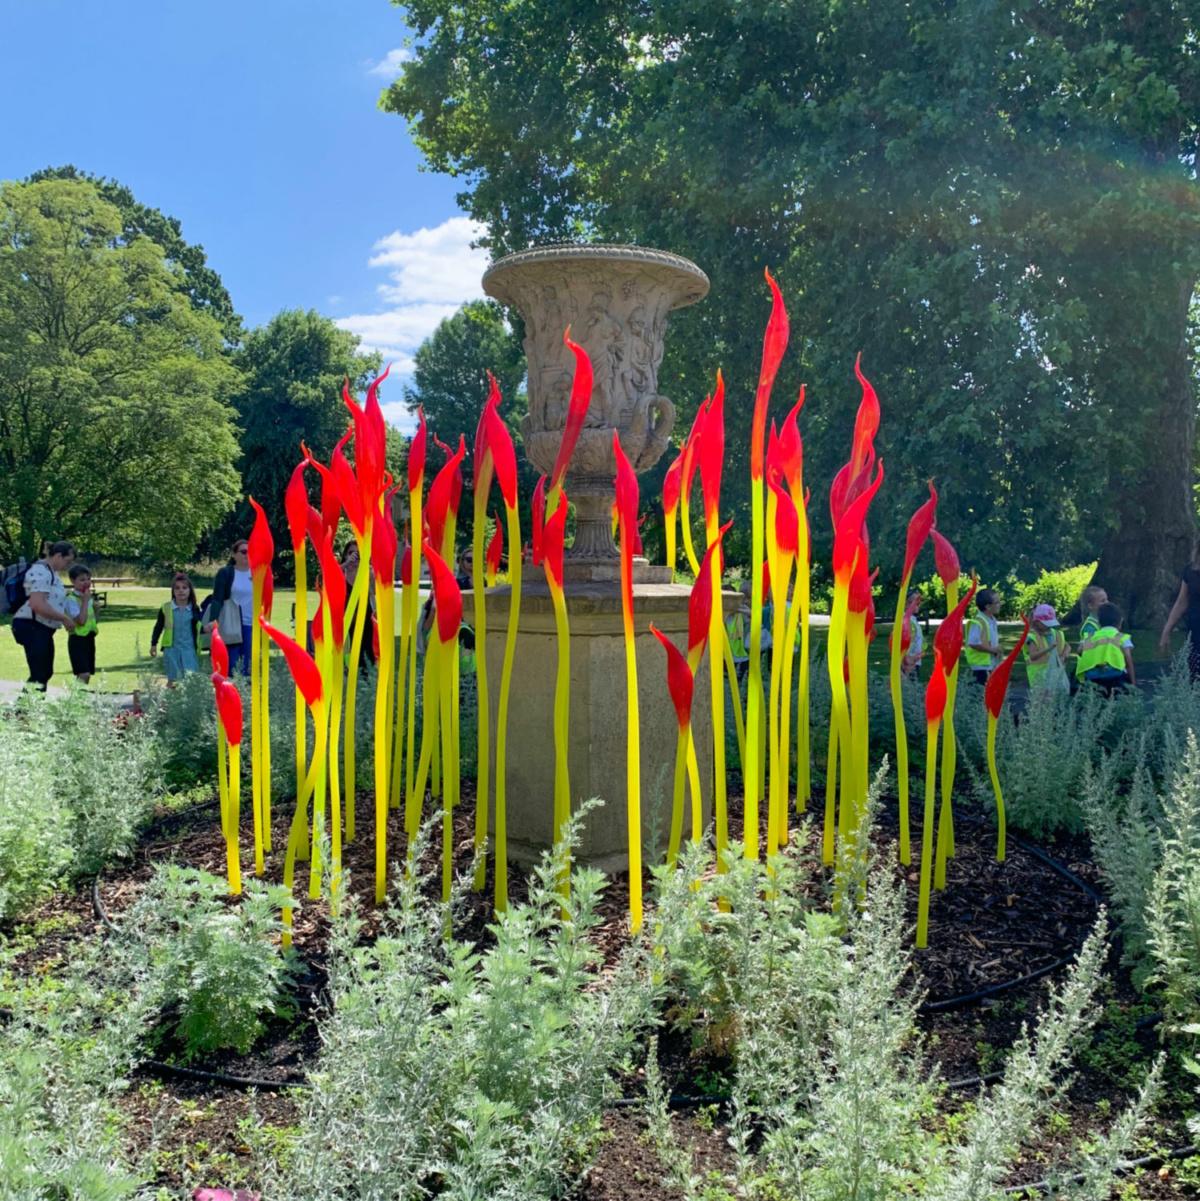 Chihuly sculpture at Kew Gardens. Details at une femme d'un certain age.